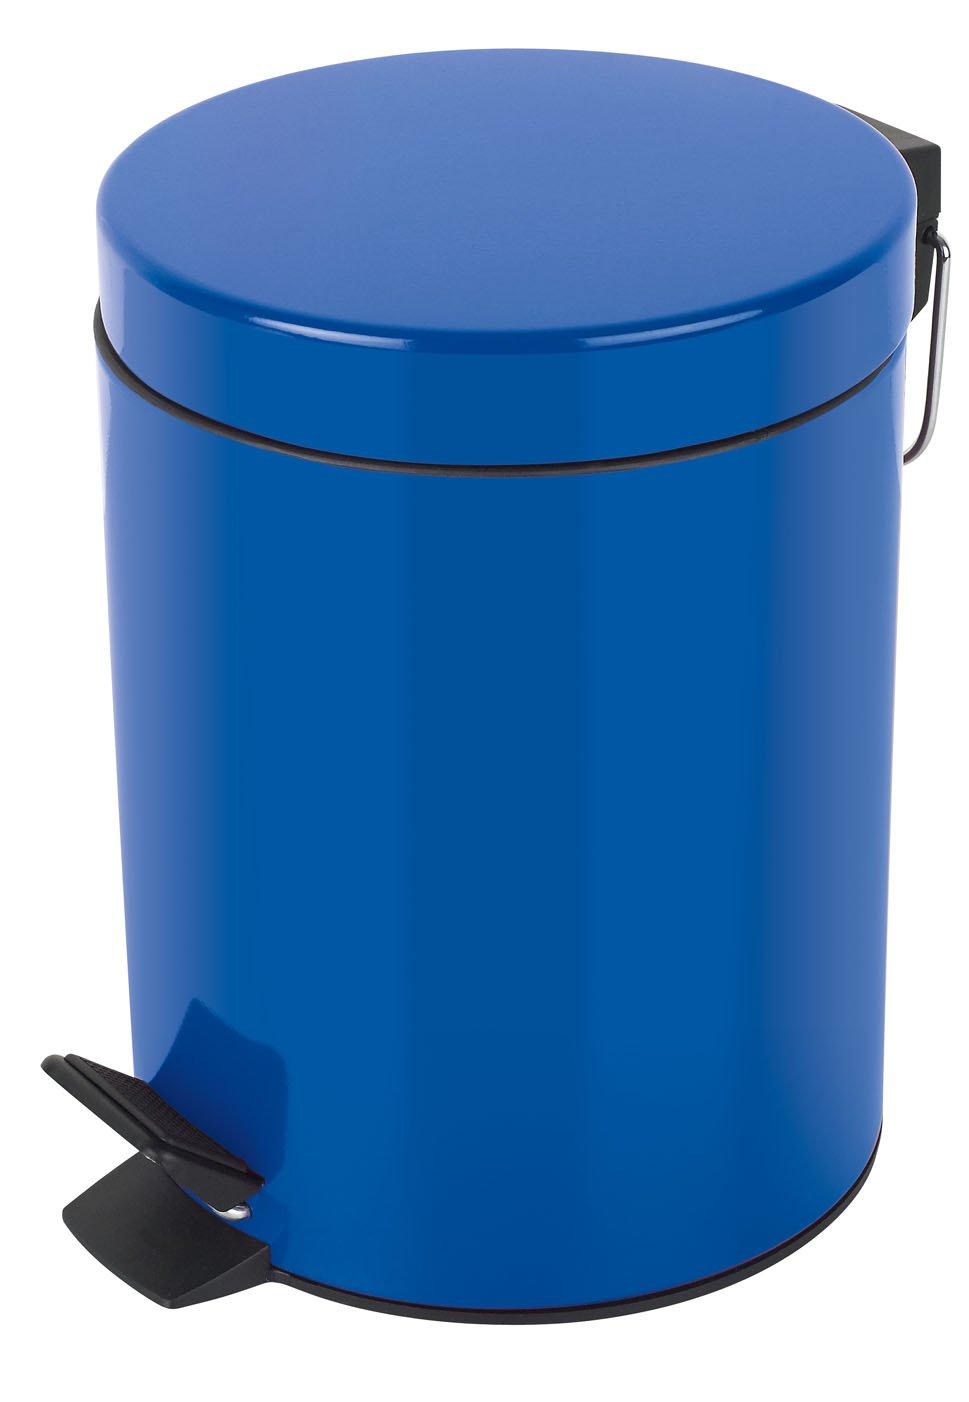 Azul 5 litros Papelera con Pedal /Ø20 x 27 cm Metal Spirella colecci/ón Sydney